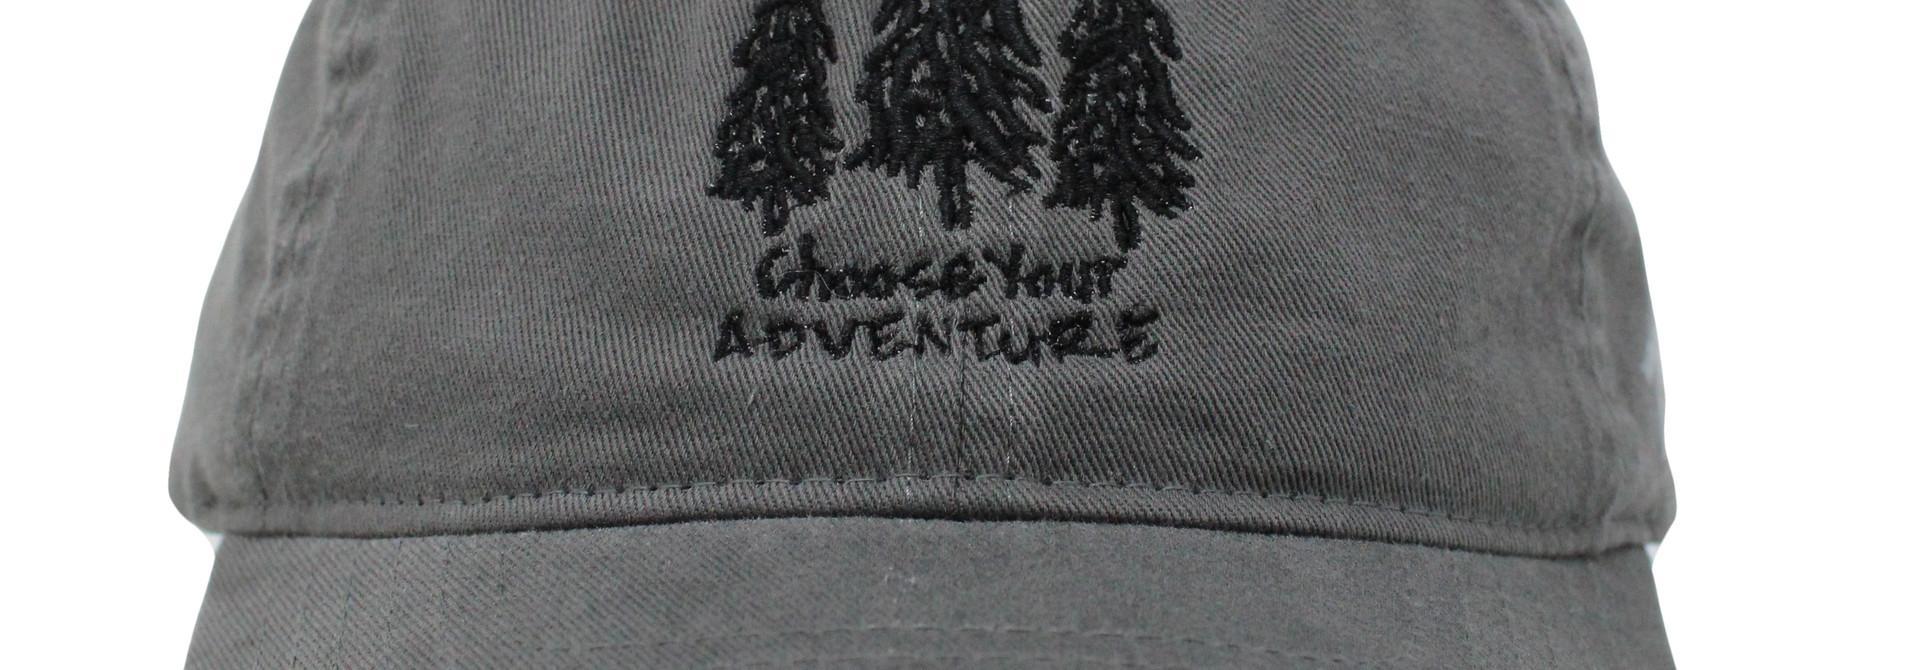 Choose your Adventure Ball Cap